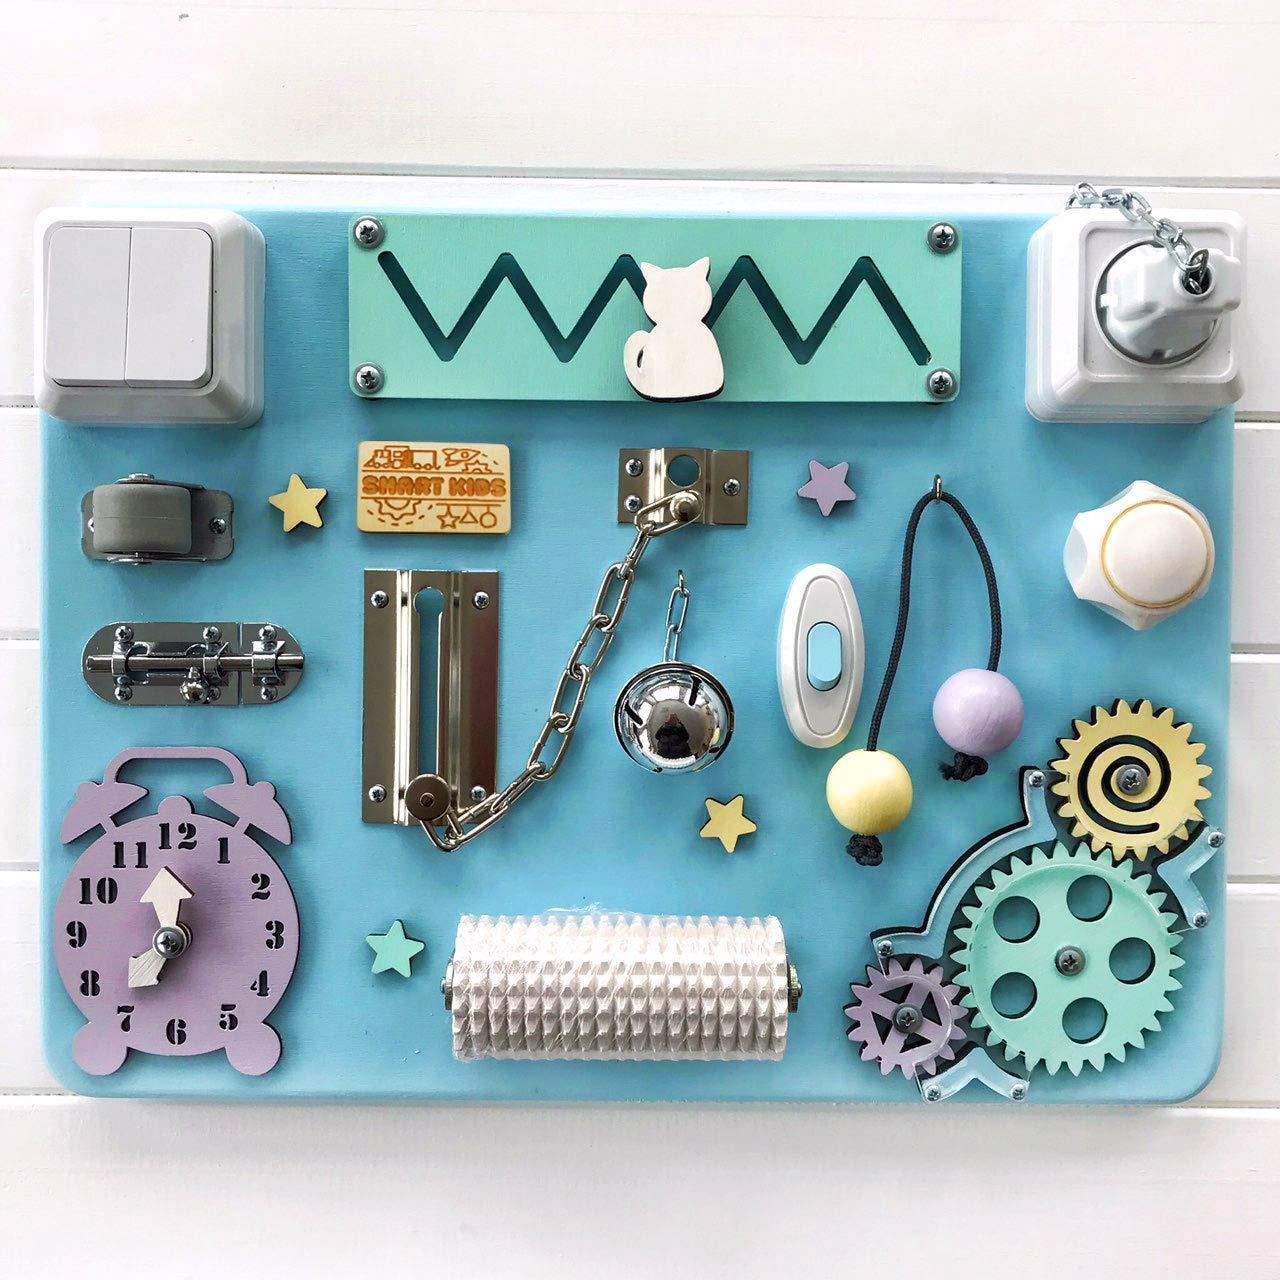 Busy Board Activity Board Montessori Principles Natural Learning | Latch Locks Board | Educational Activity Toy | Activity Board Boys | from The Manufacturer (Blue)